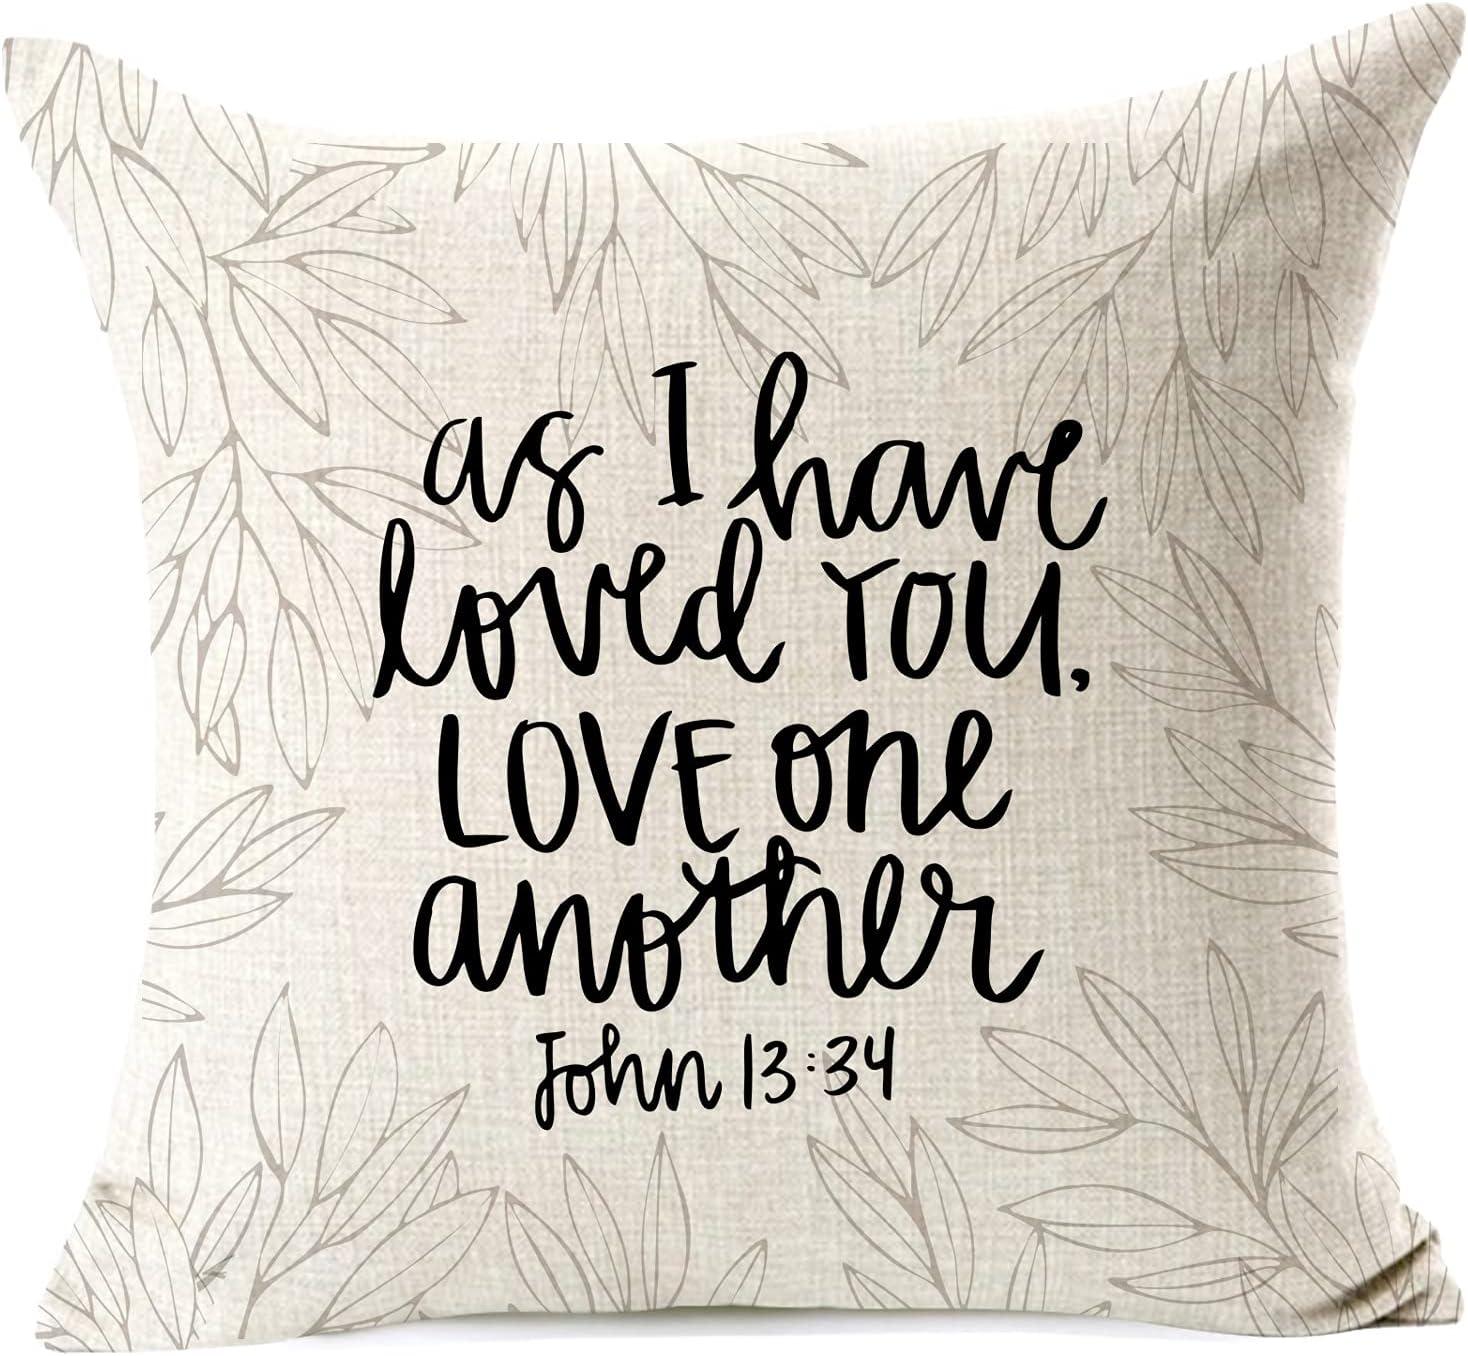 963RW Christian Love Pillowcase Home L Finally resale start Pillow ...